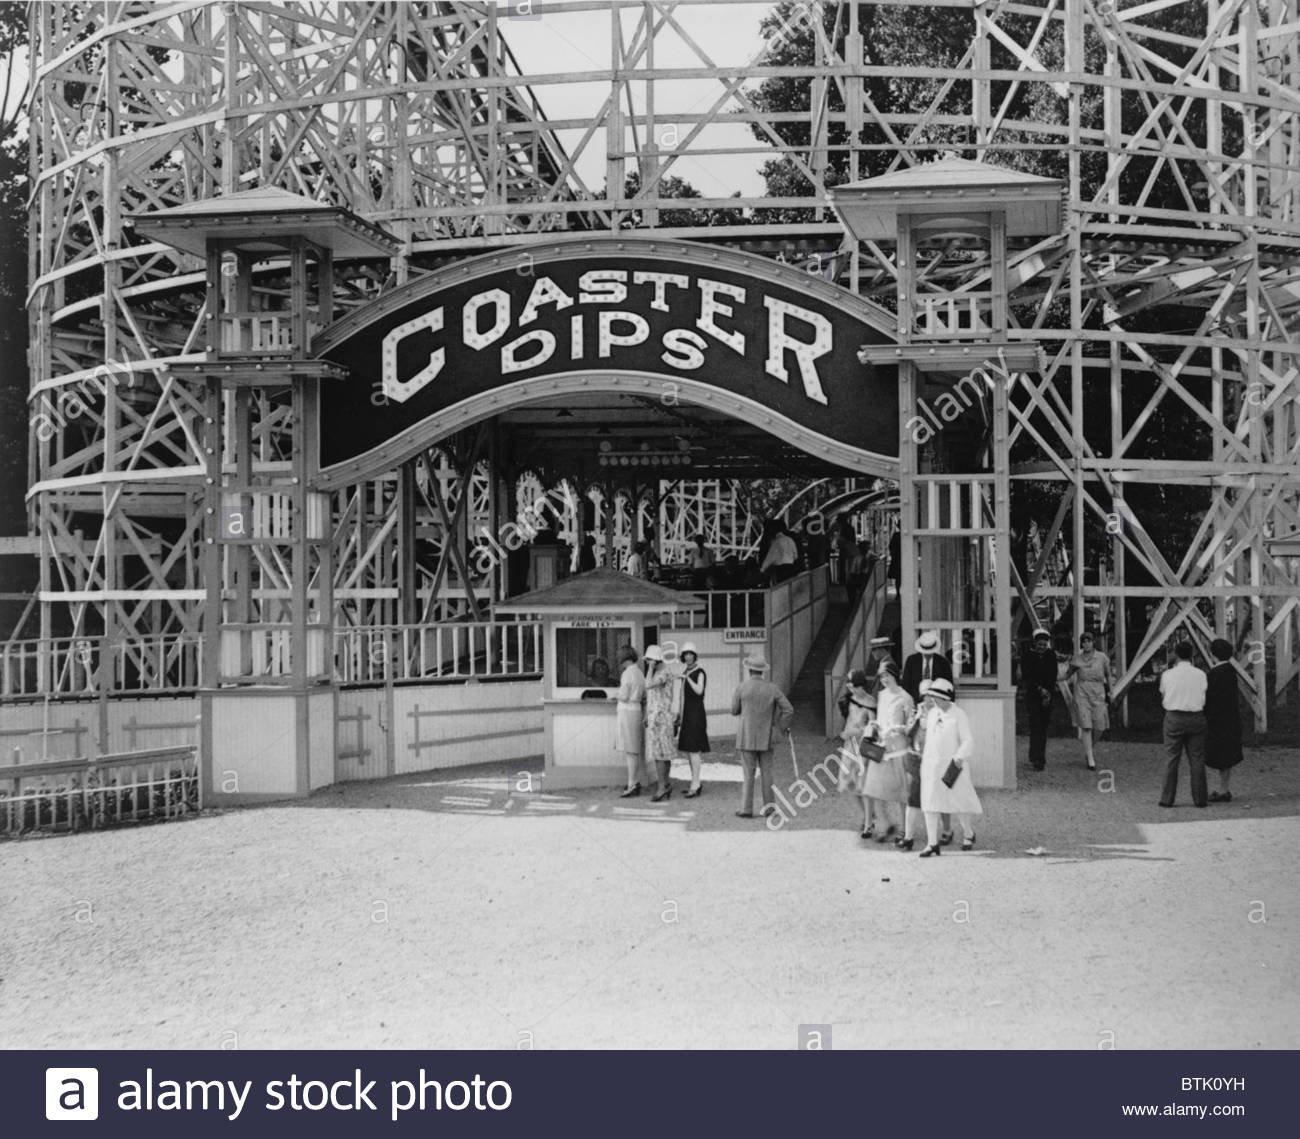 Coaster Dips ride at the Amusement Park, Historic American Buildings Survey (public domain)